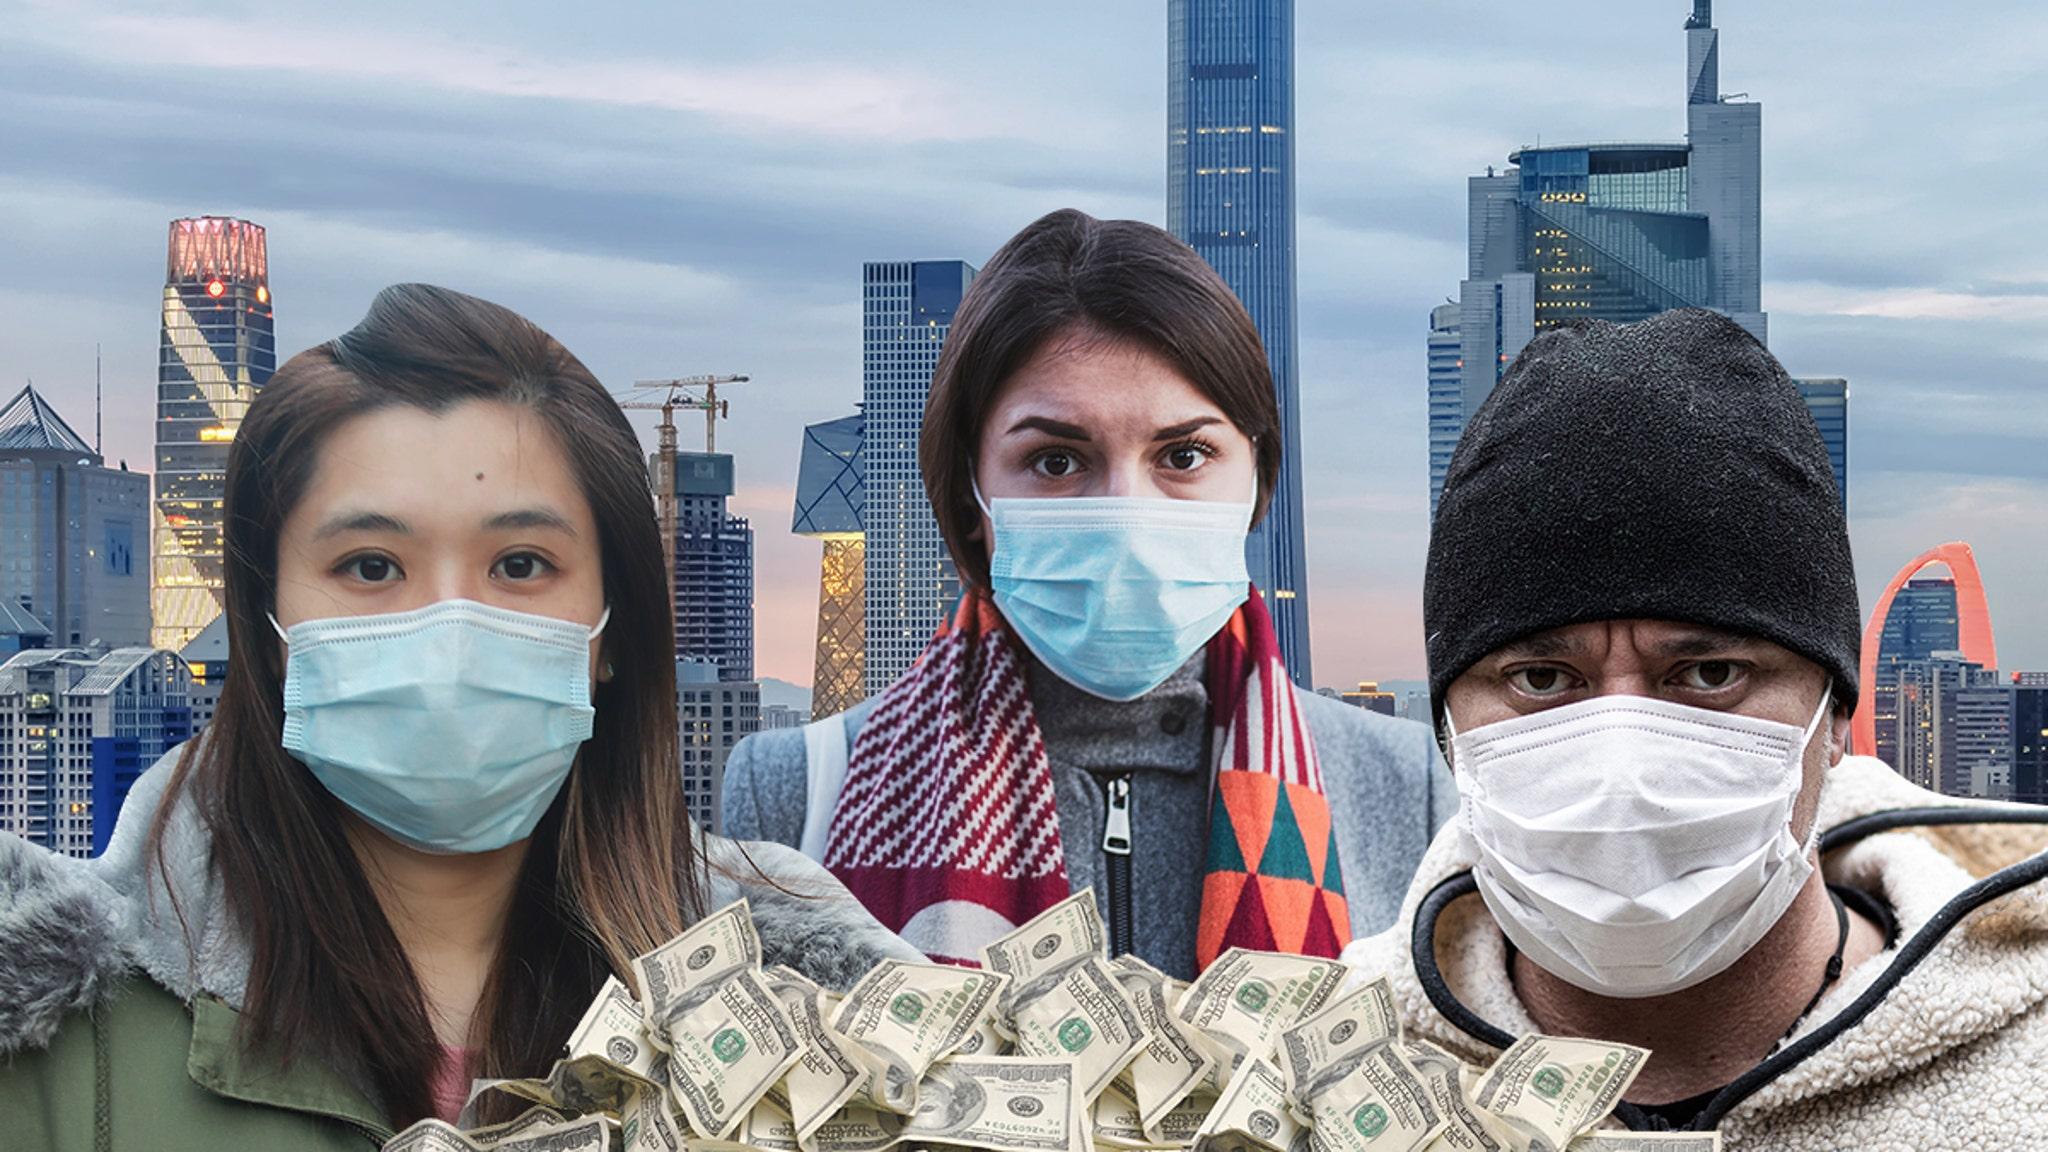 U.S. Company Gets $67 Mil in Coronavirus Mask Orders, Can't Meet Demand